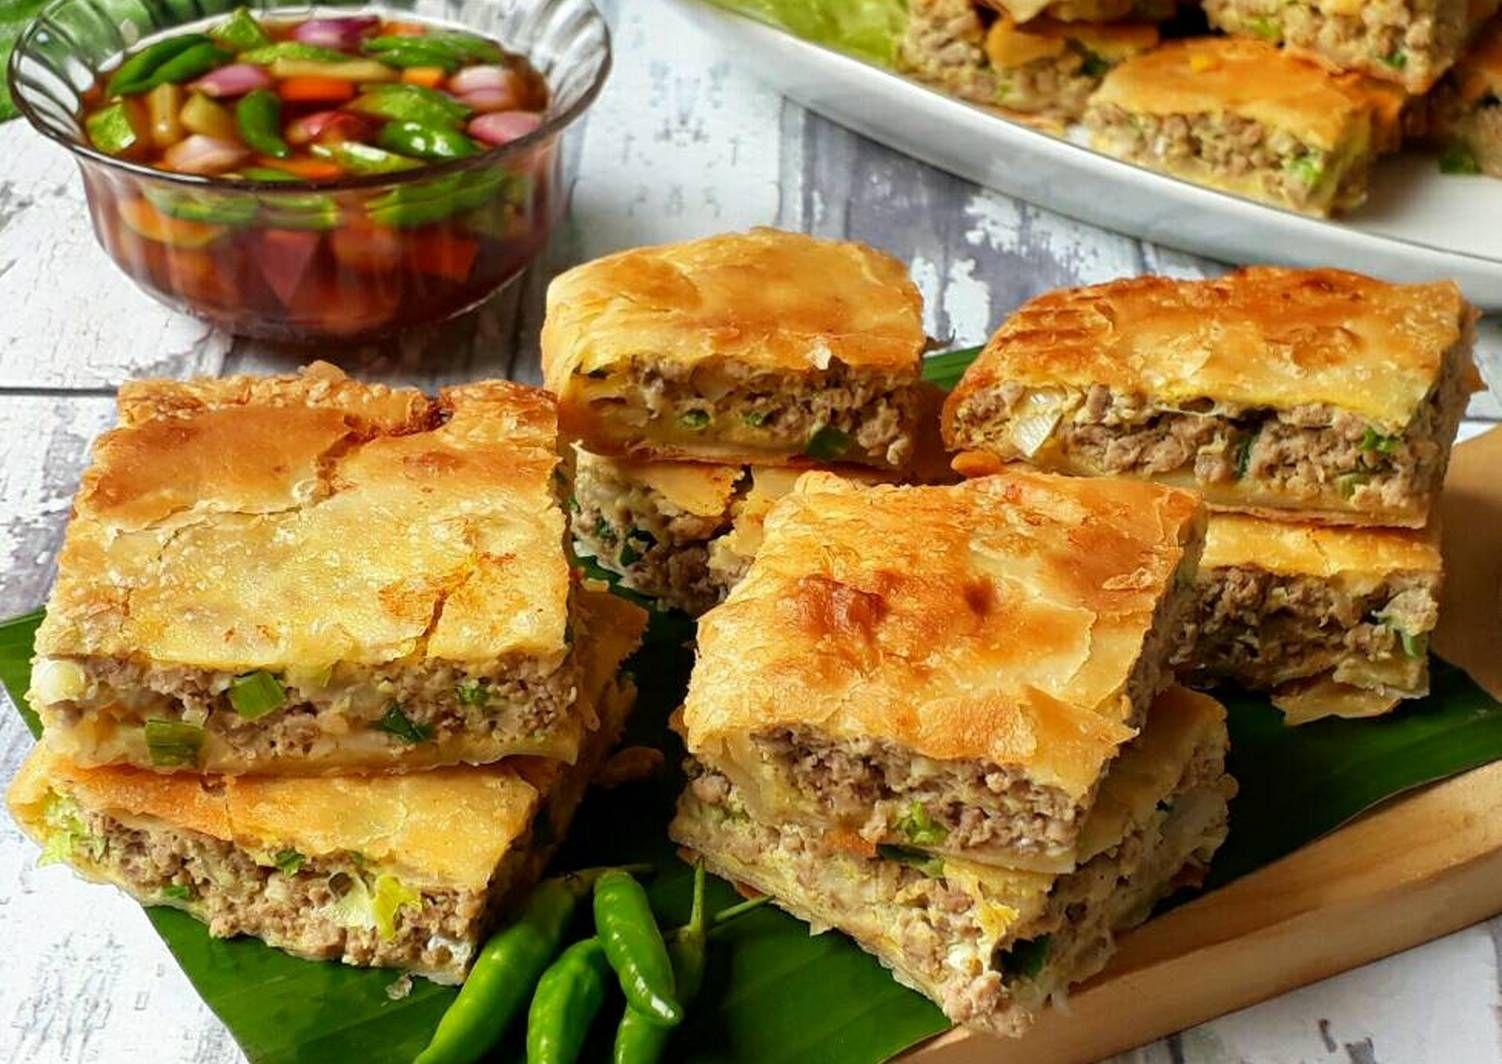 Resep Martabak Telur Martabak Mesir Oleh Sukmawati Rs Resep Resep Masakan Indonesia Resep Resep Masakan